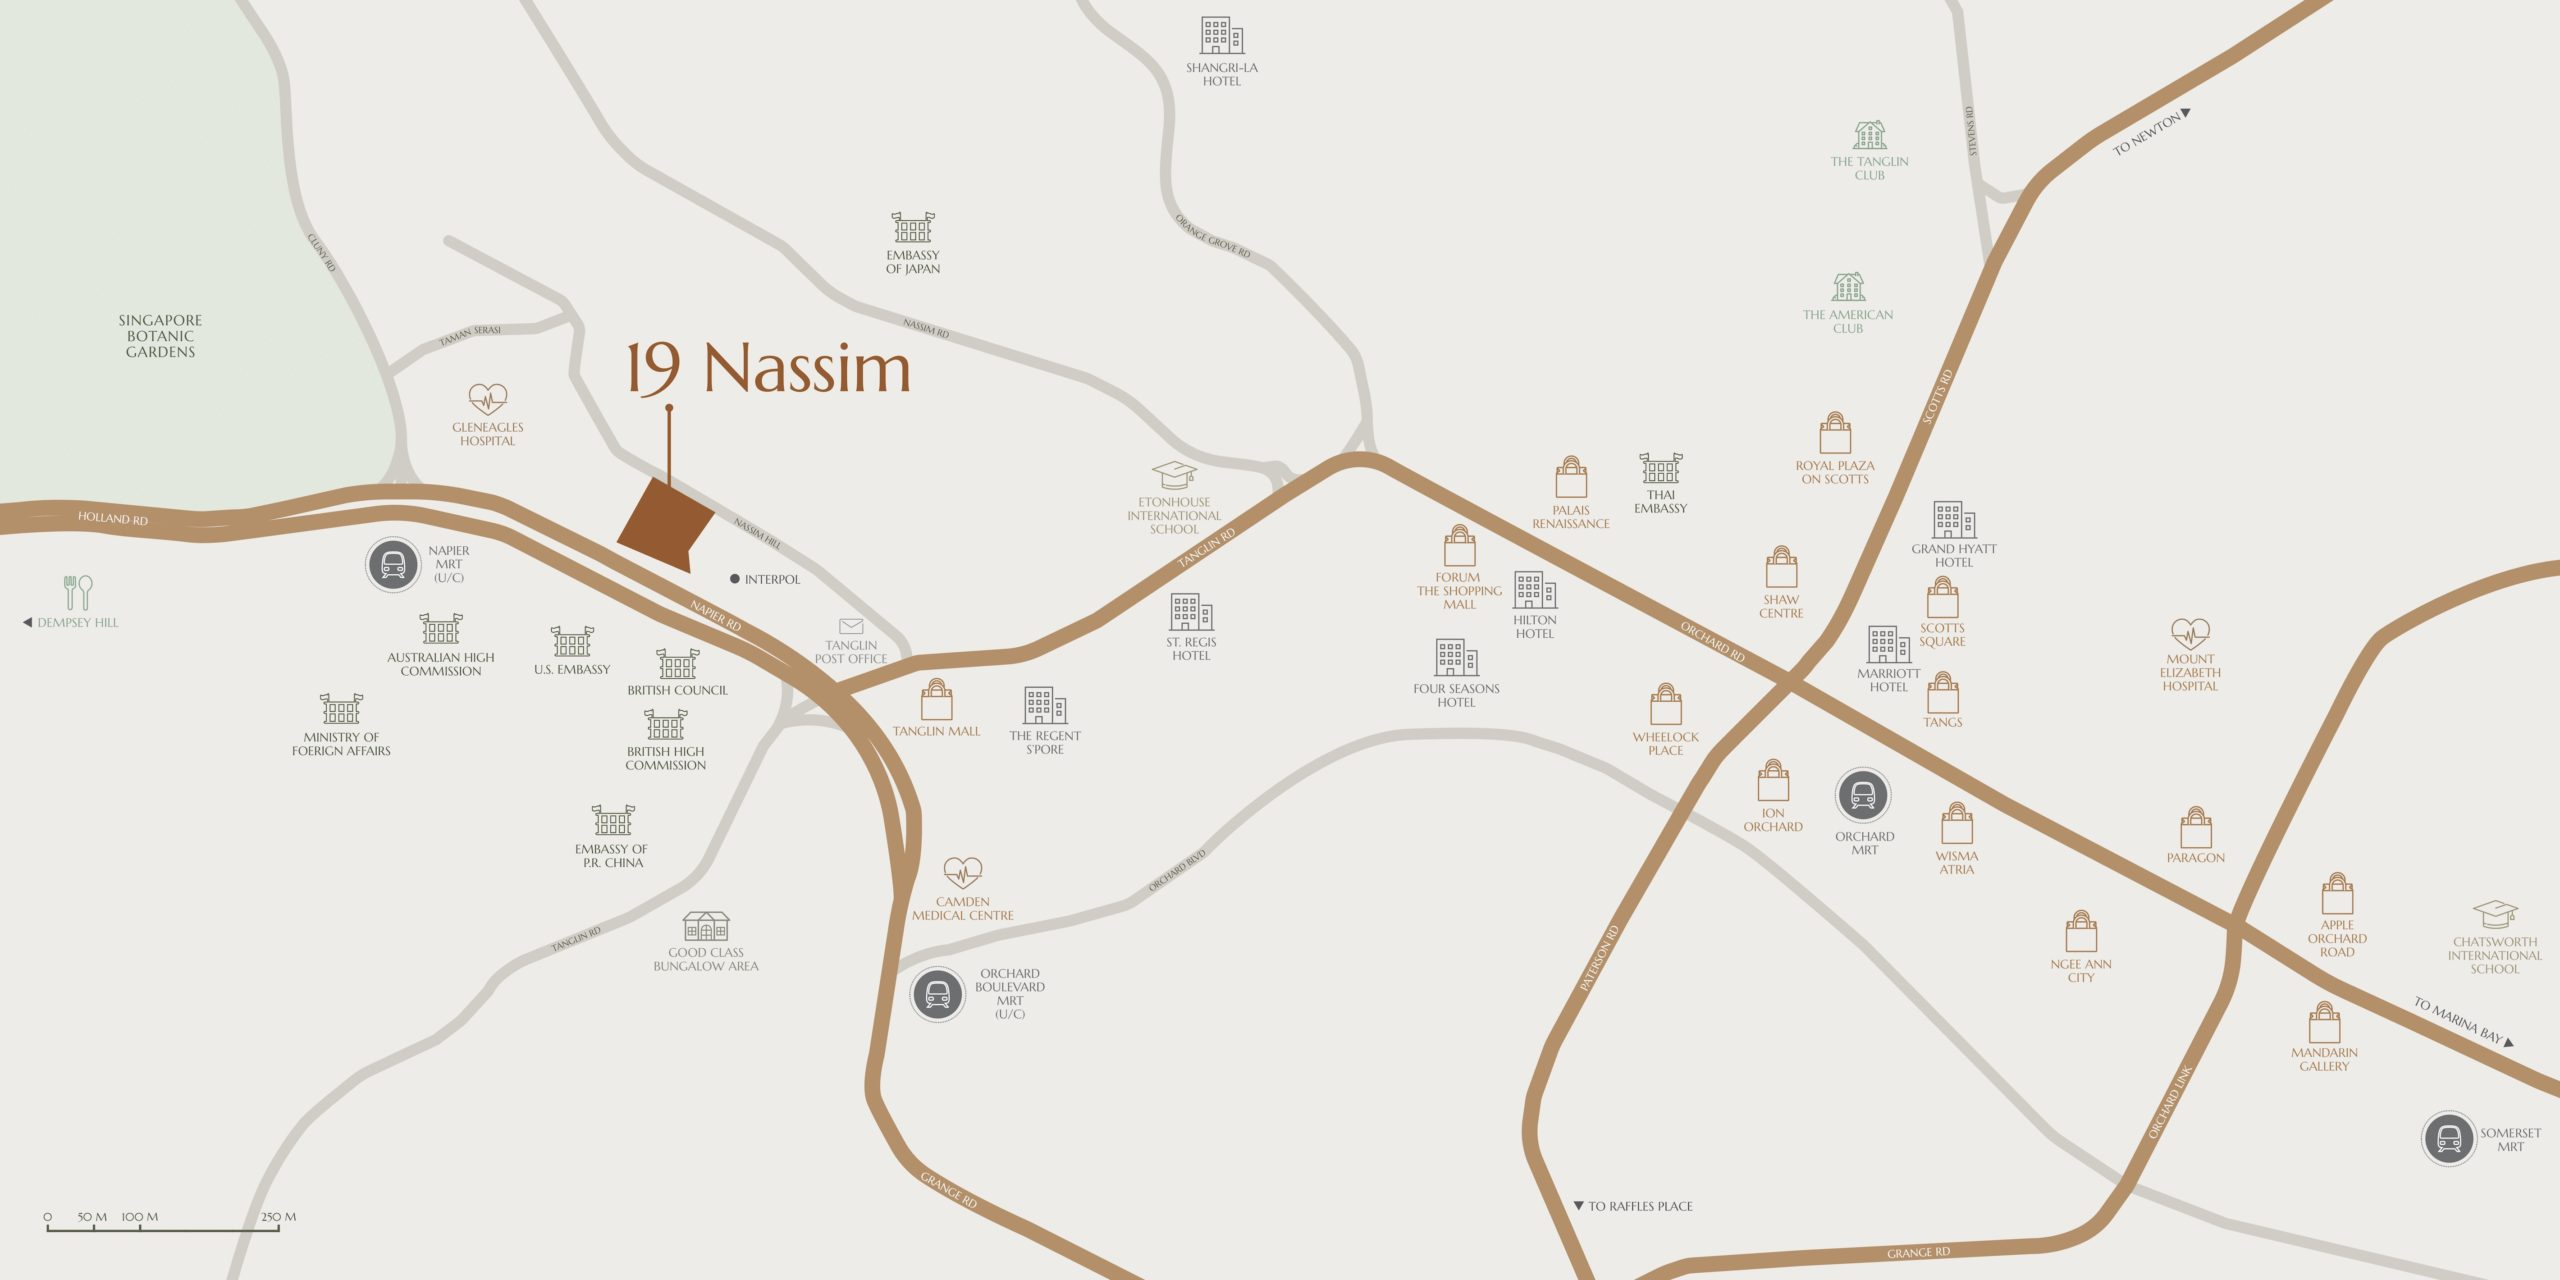 19 Nassim 纳森山公寓 location map